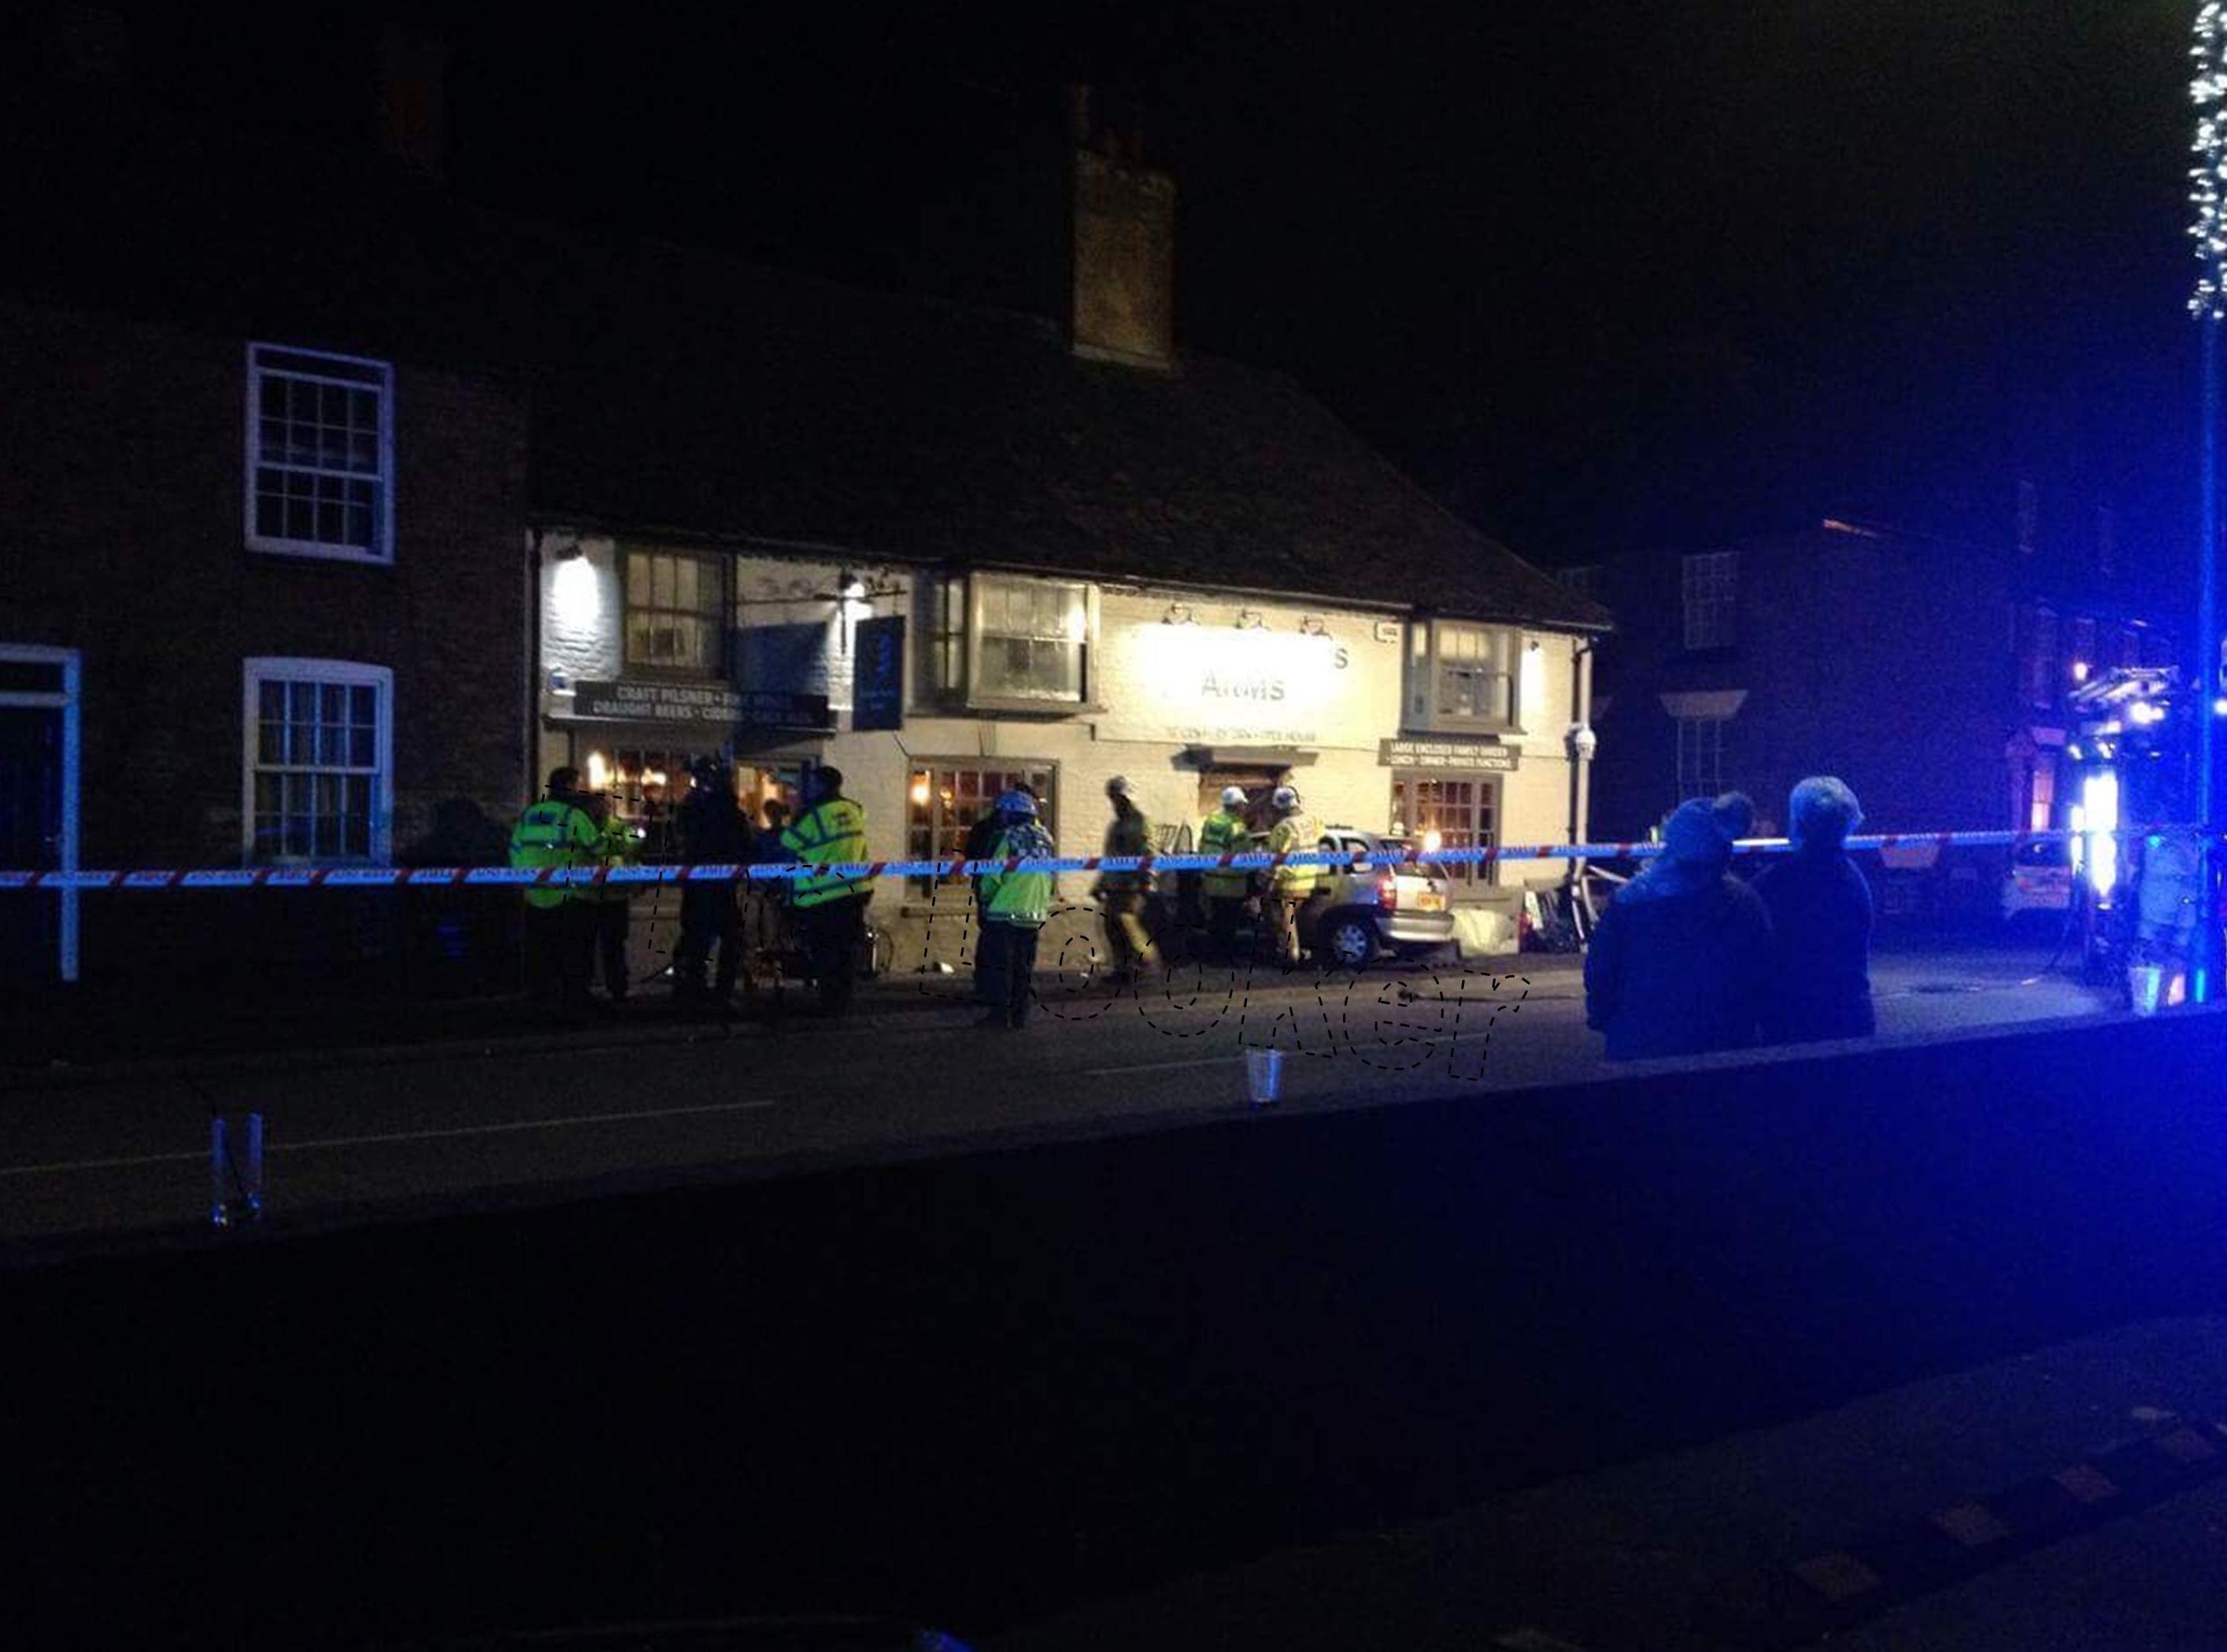 Is New Romney's Cinque Ports pub the unluckiest pub in Britain?